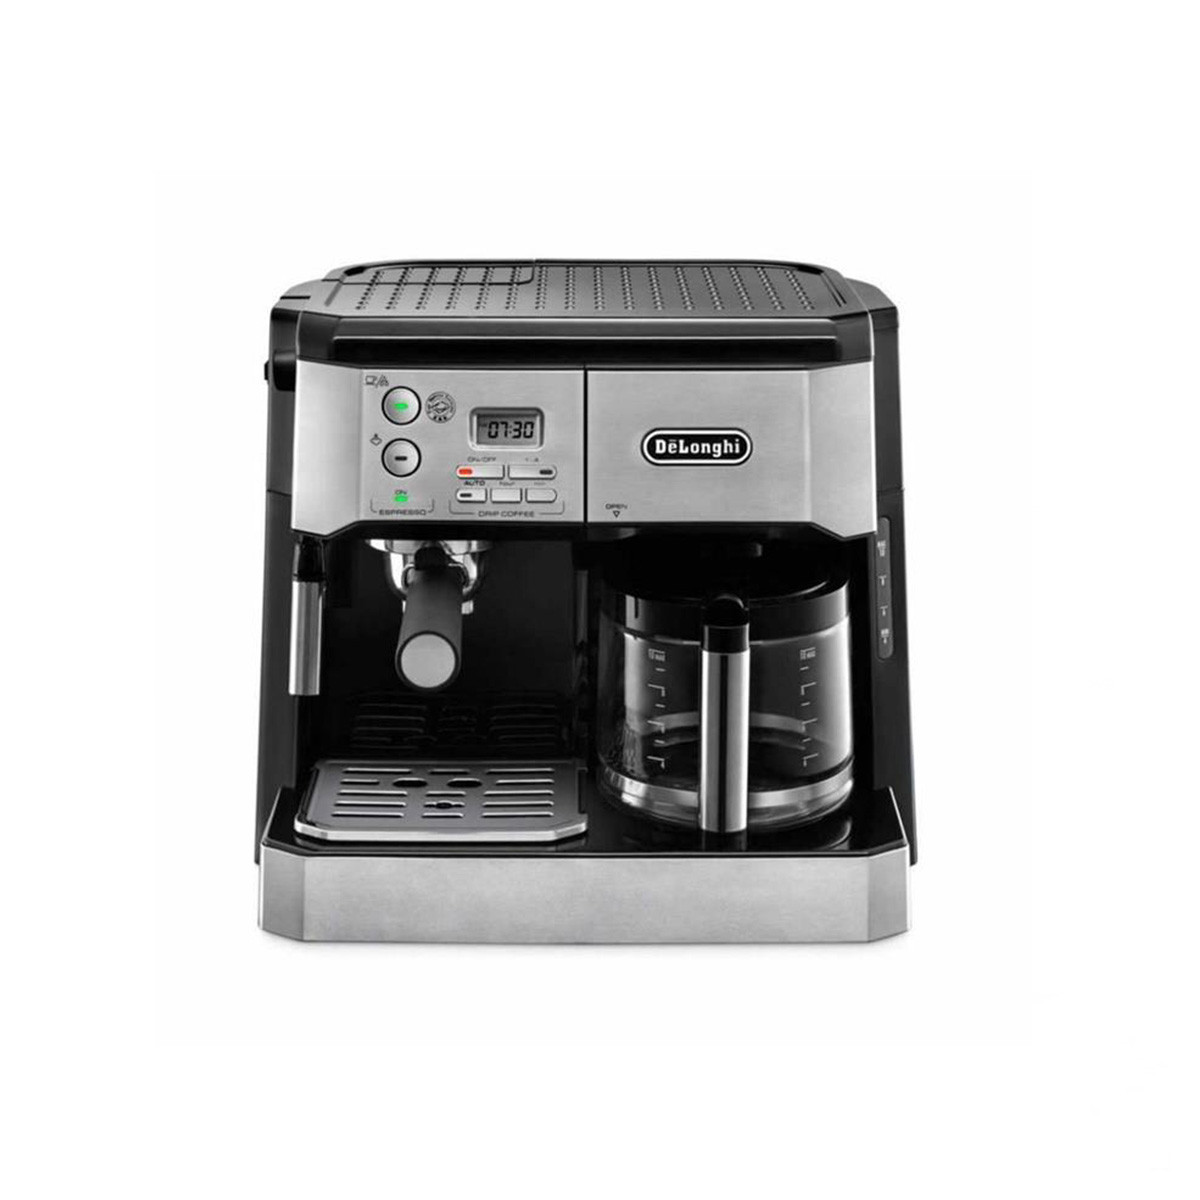 تصویر اسپرسوساز دلونگی مدل Delonghi  BCO431.S DelonghiBCO 431.S  EspressoMachine